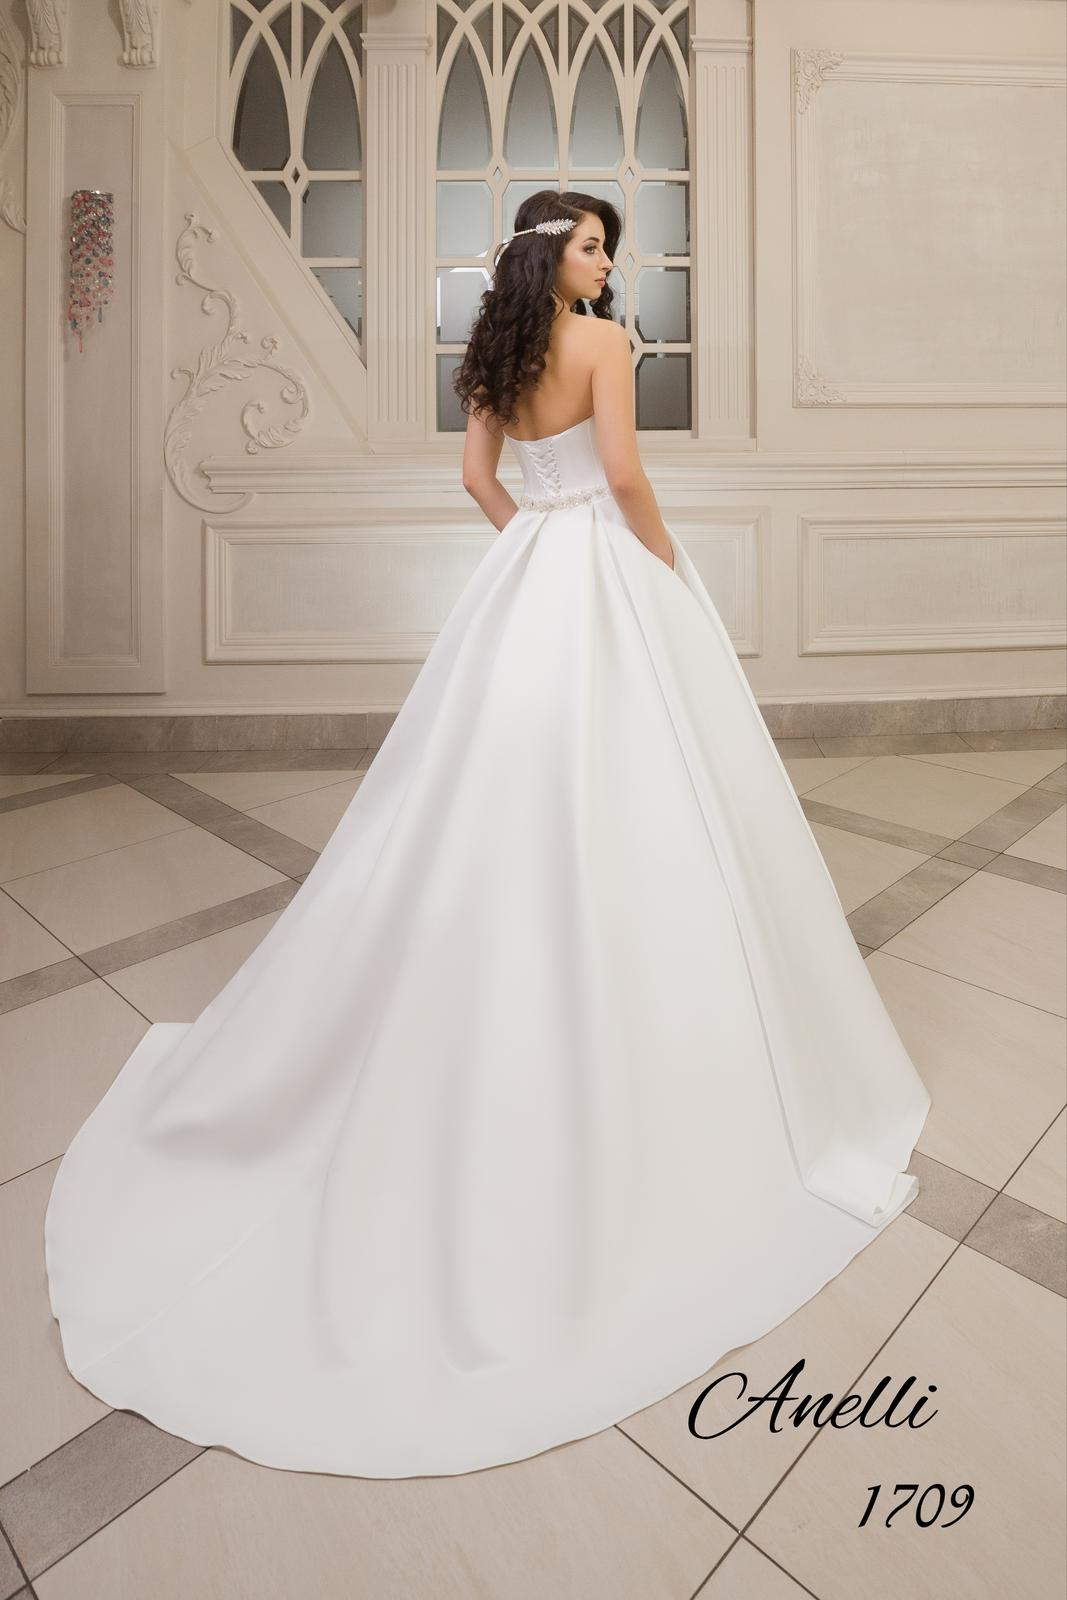 Svadobné šaty - Debut 1709 - Obrázok č. 4